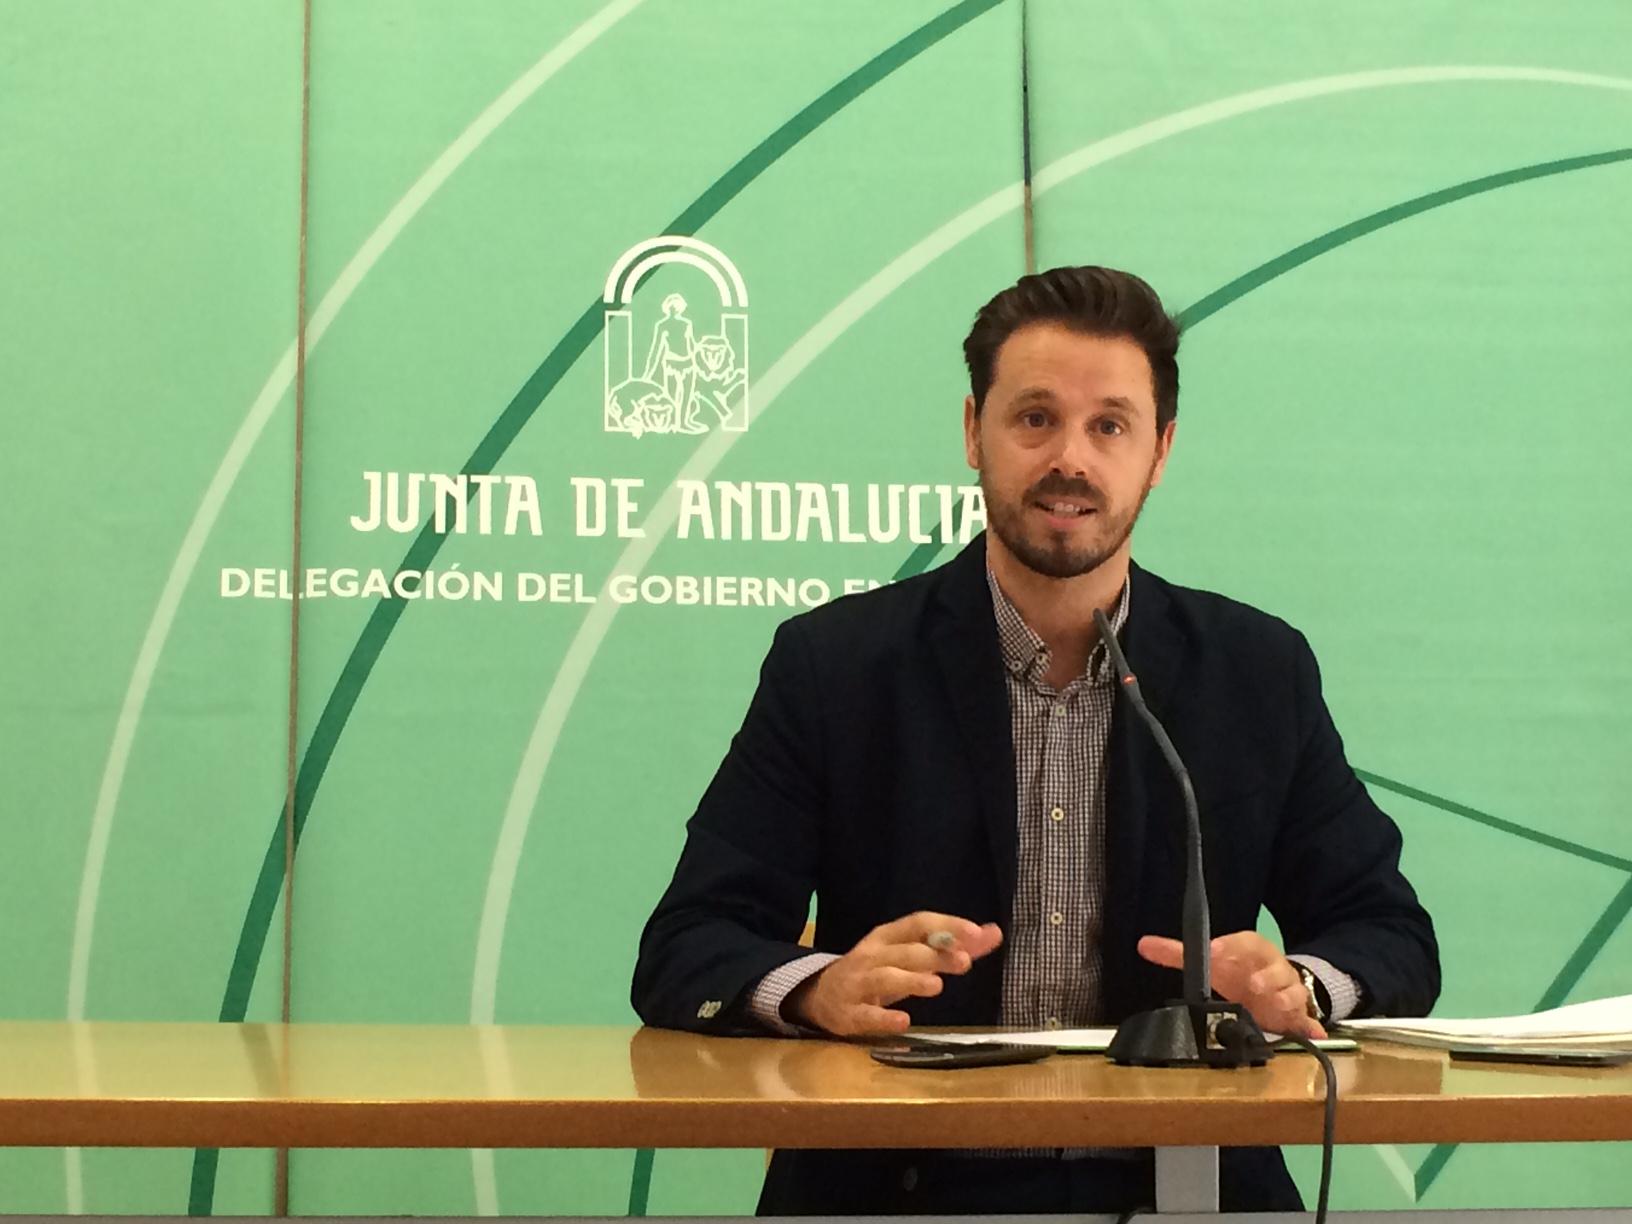 industria agroalimentaria en andalucia: